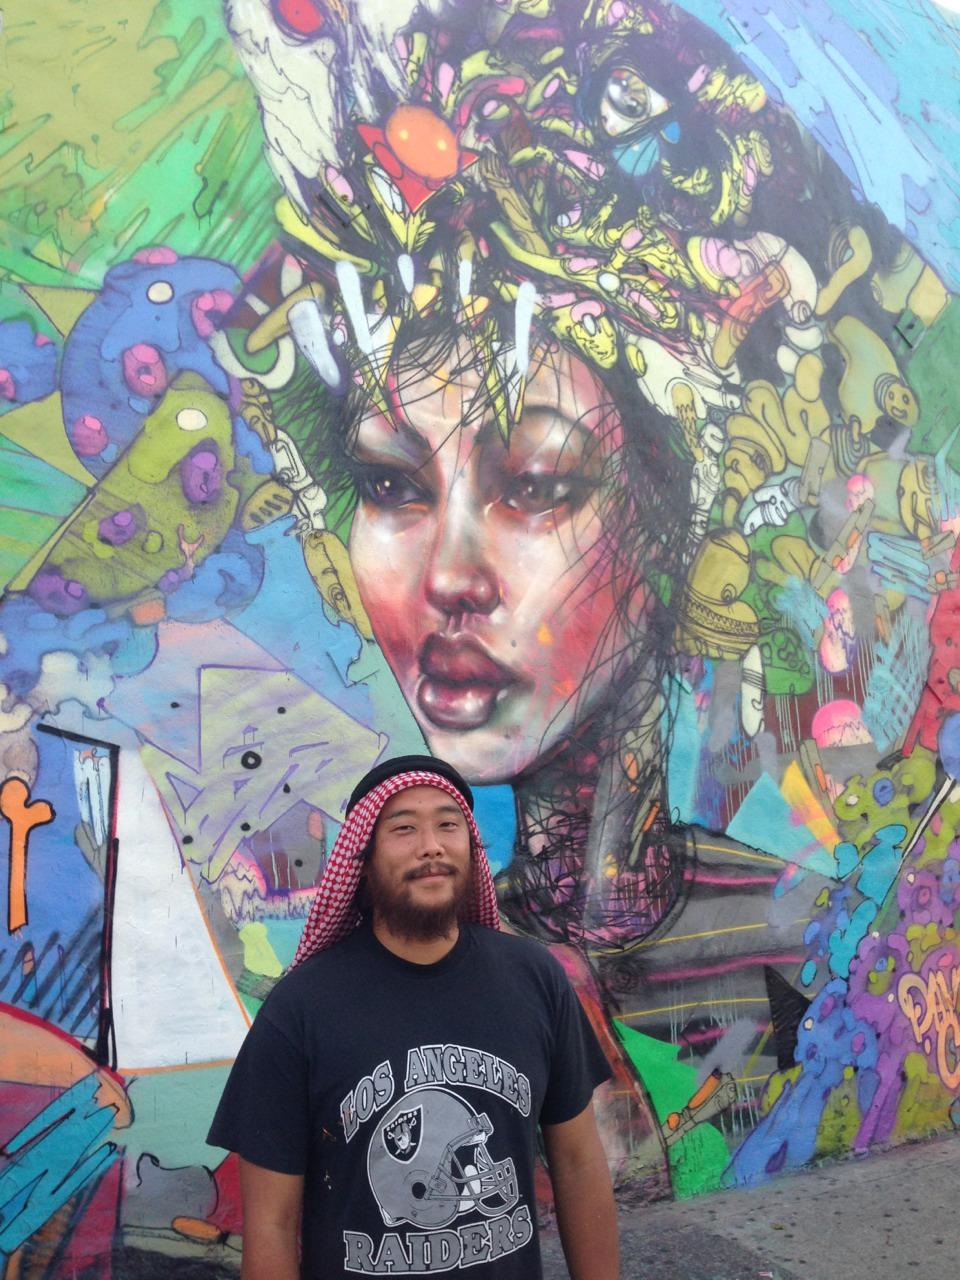 David-Choe-Aryz-Retna-Mural-LA-04